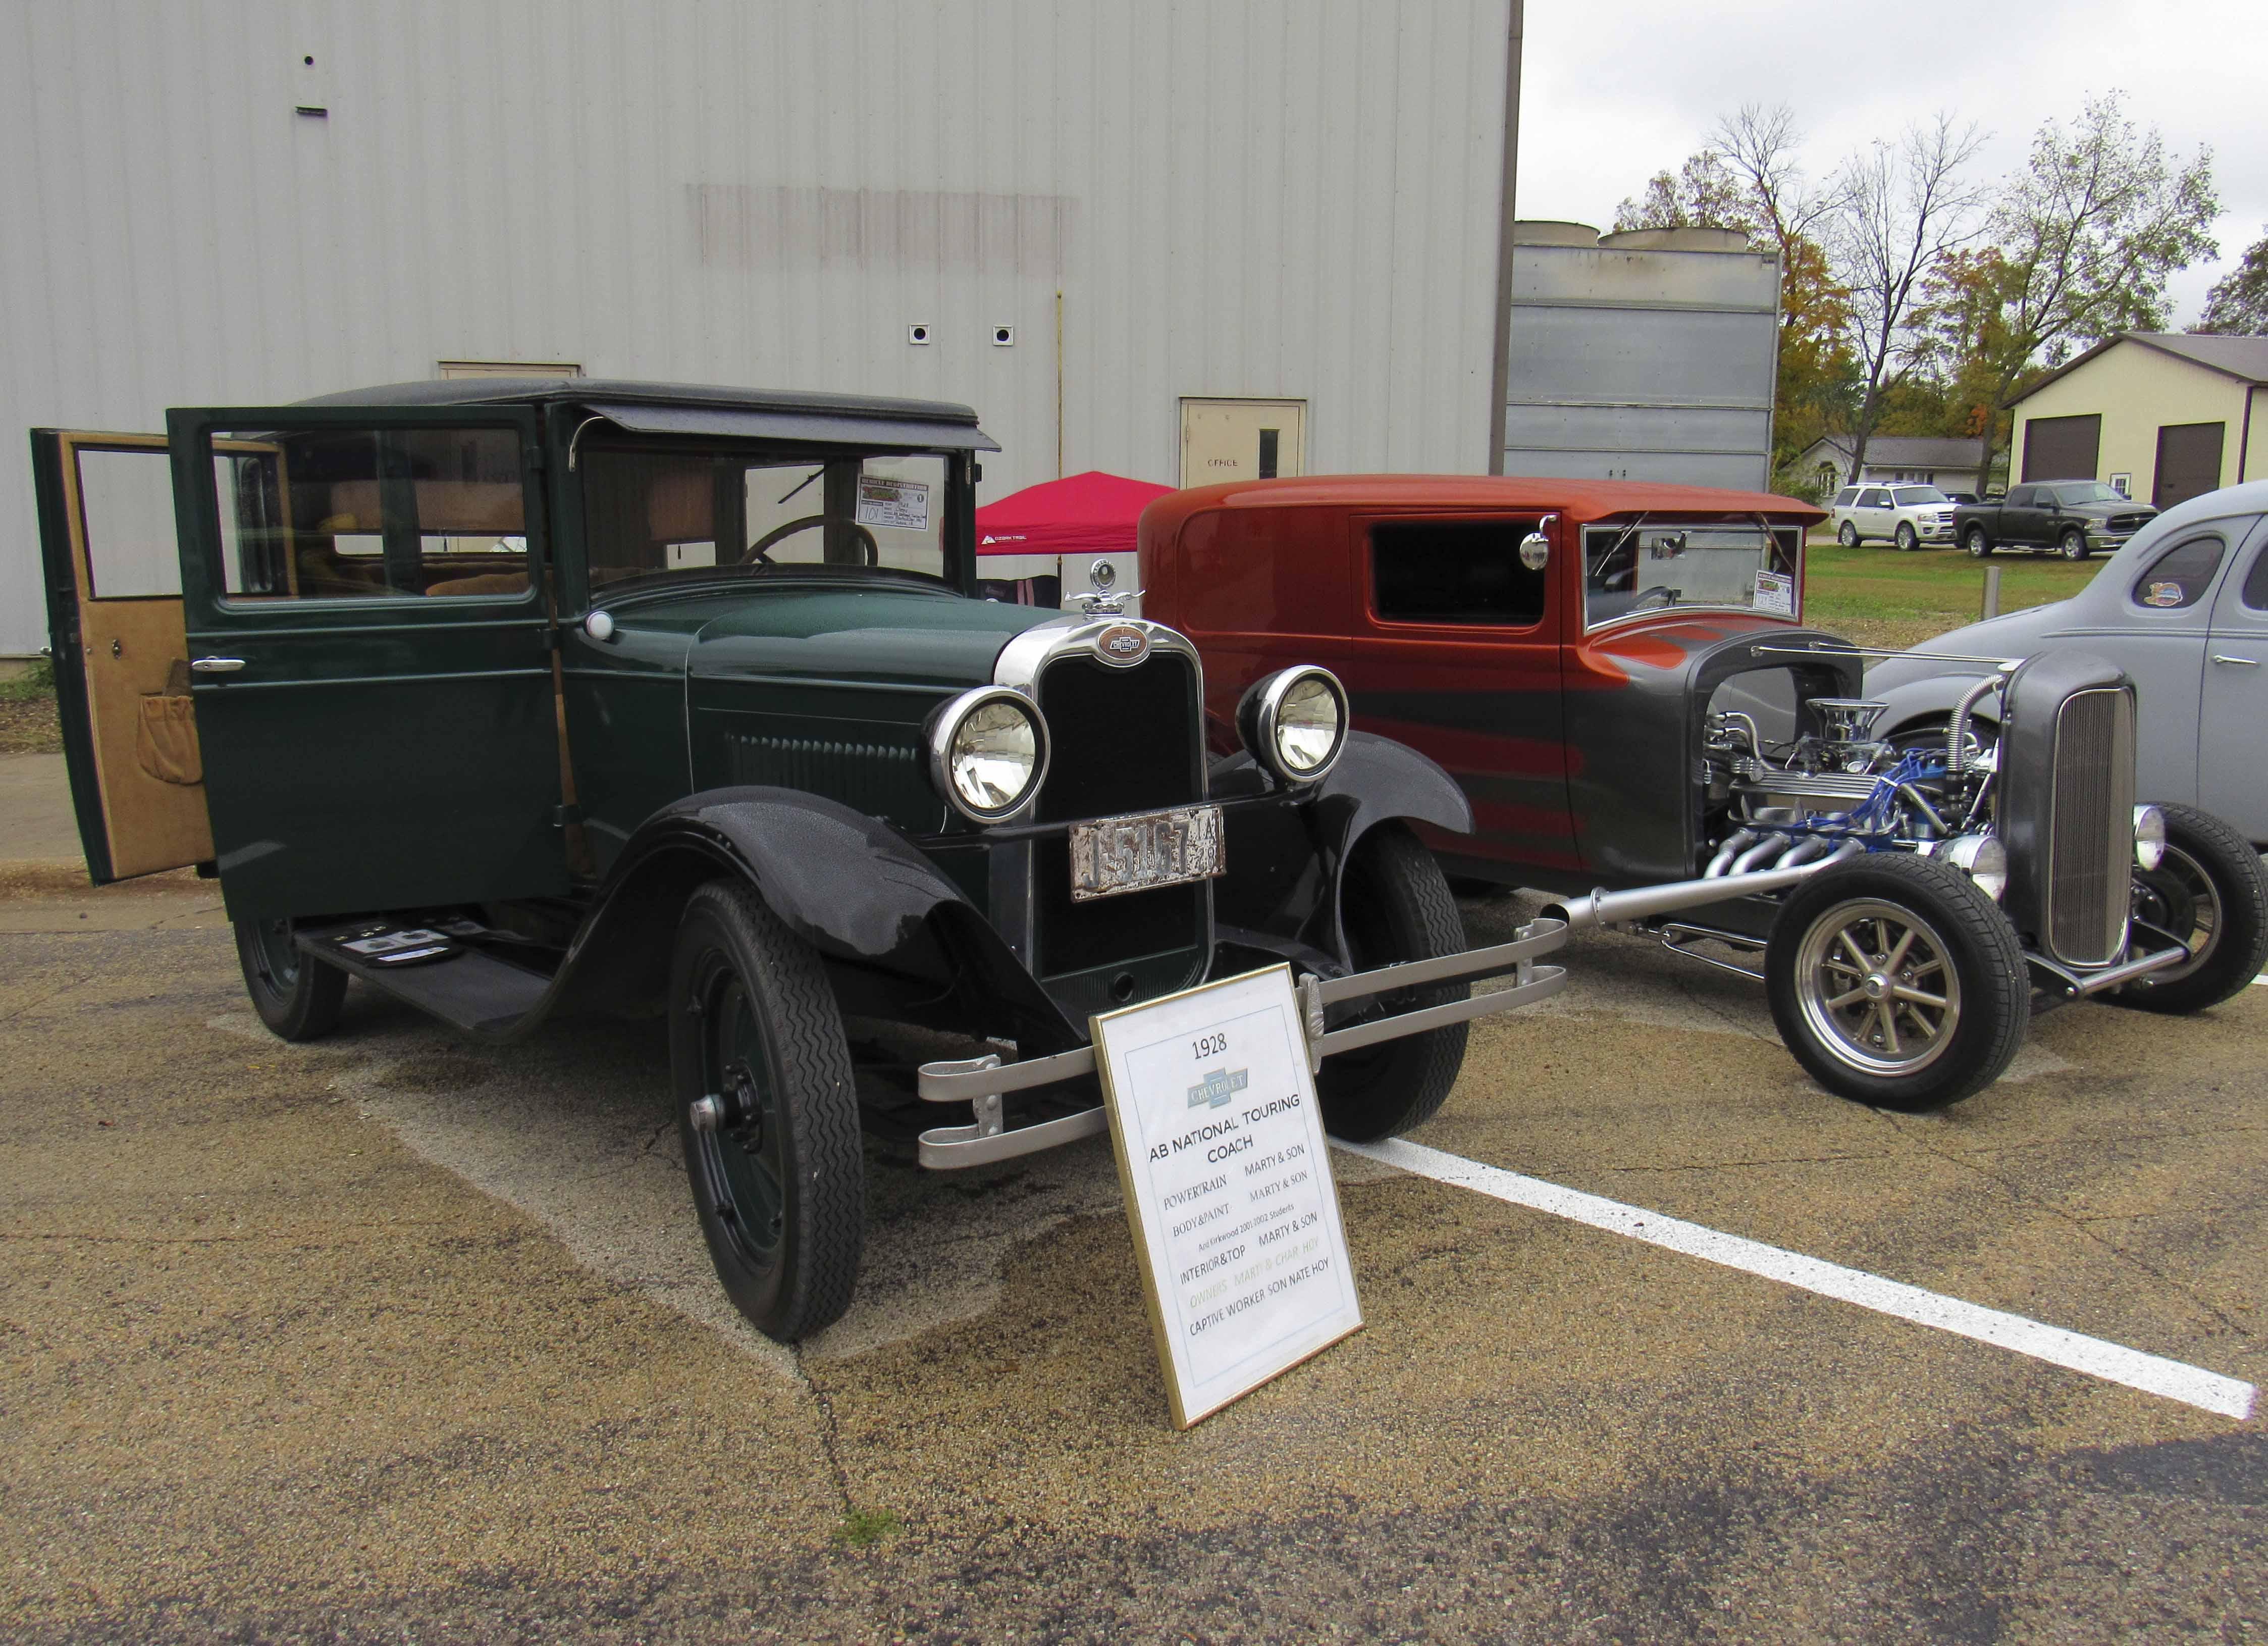 Hot Rods Harleys Car Show The Monticello Express - Thomas chevy car show